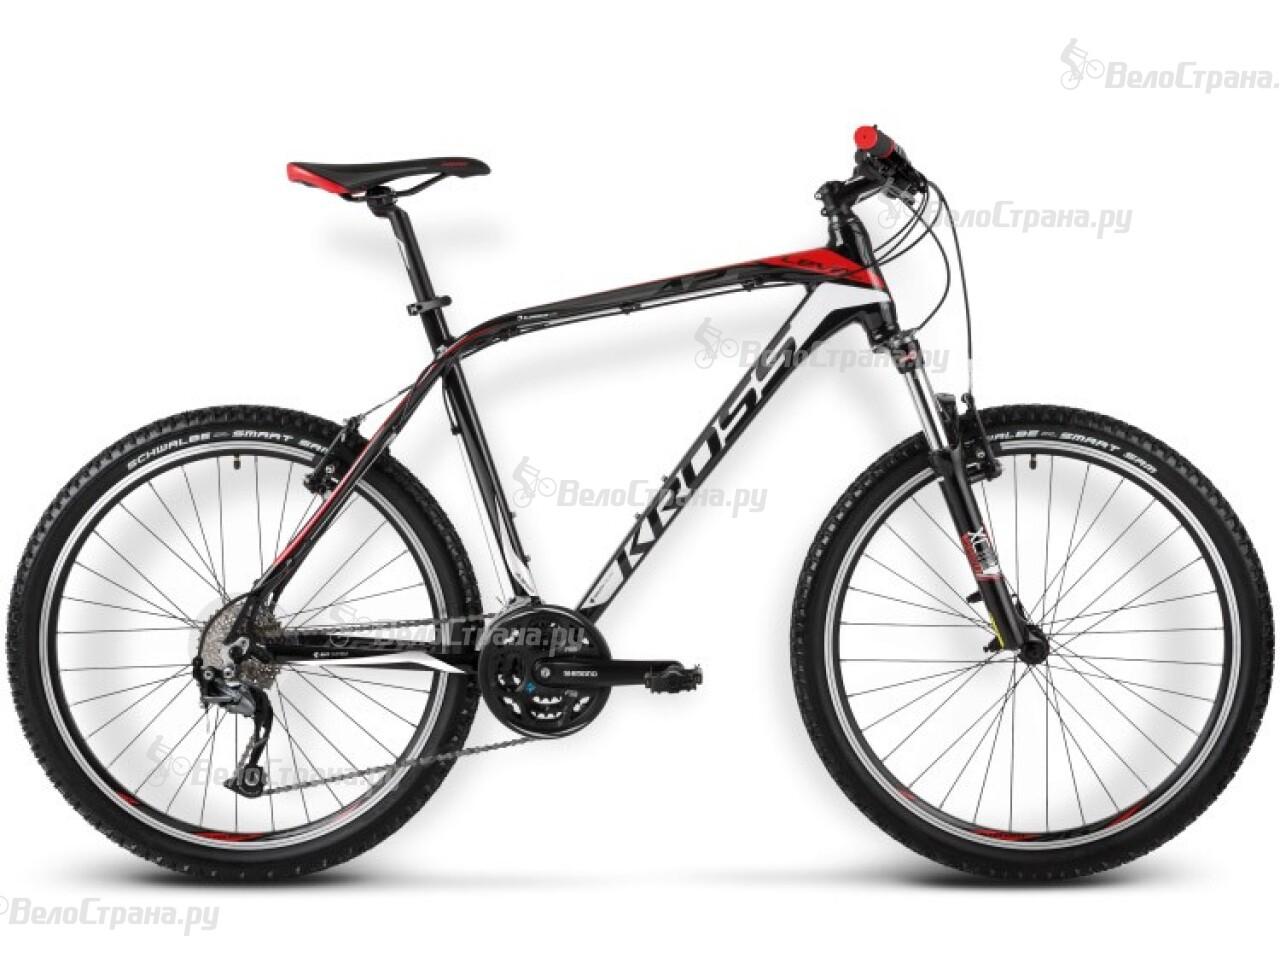 Велосипед Kross Level A2 (2015) велосипед kross level b7 2015